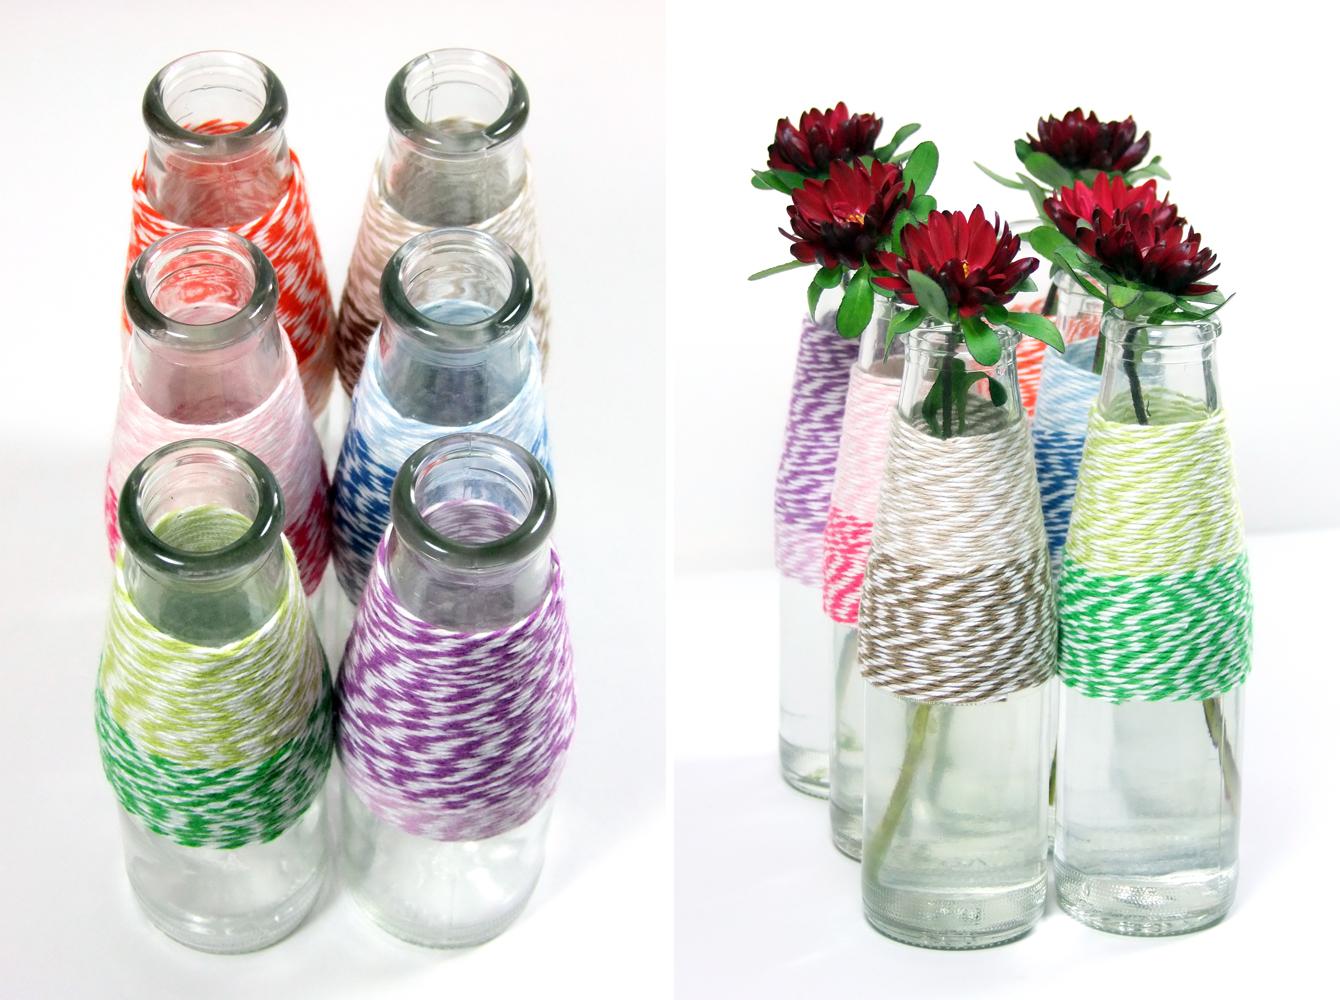 bunt bunt bunt sind alle meine vasen fee ist mein name. Black Bedroom Furniture Sets. Home Design Ideas